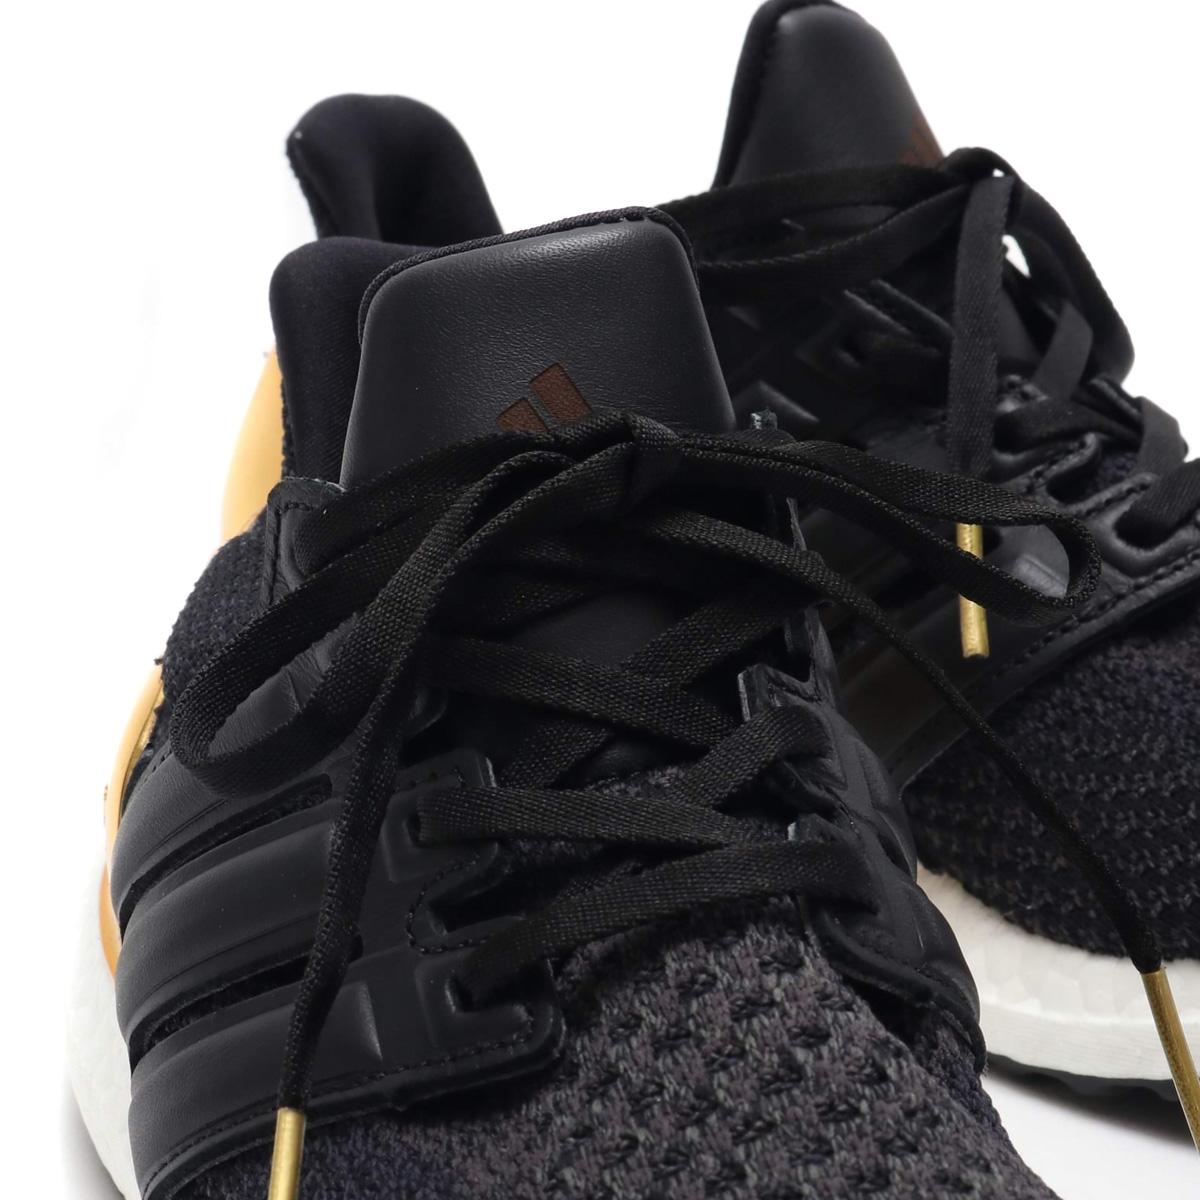 adidas ultra boost Ltd Celeb. (Adidas ultra boost LTD celebrity) CORE BLACKCORE BLACKGOLD MEDAL 18FW S